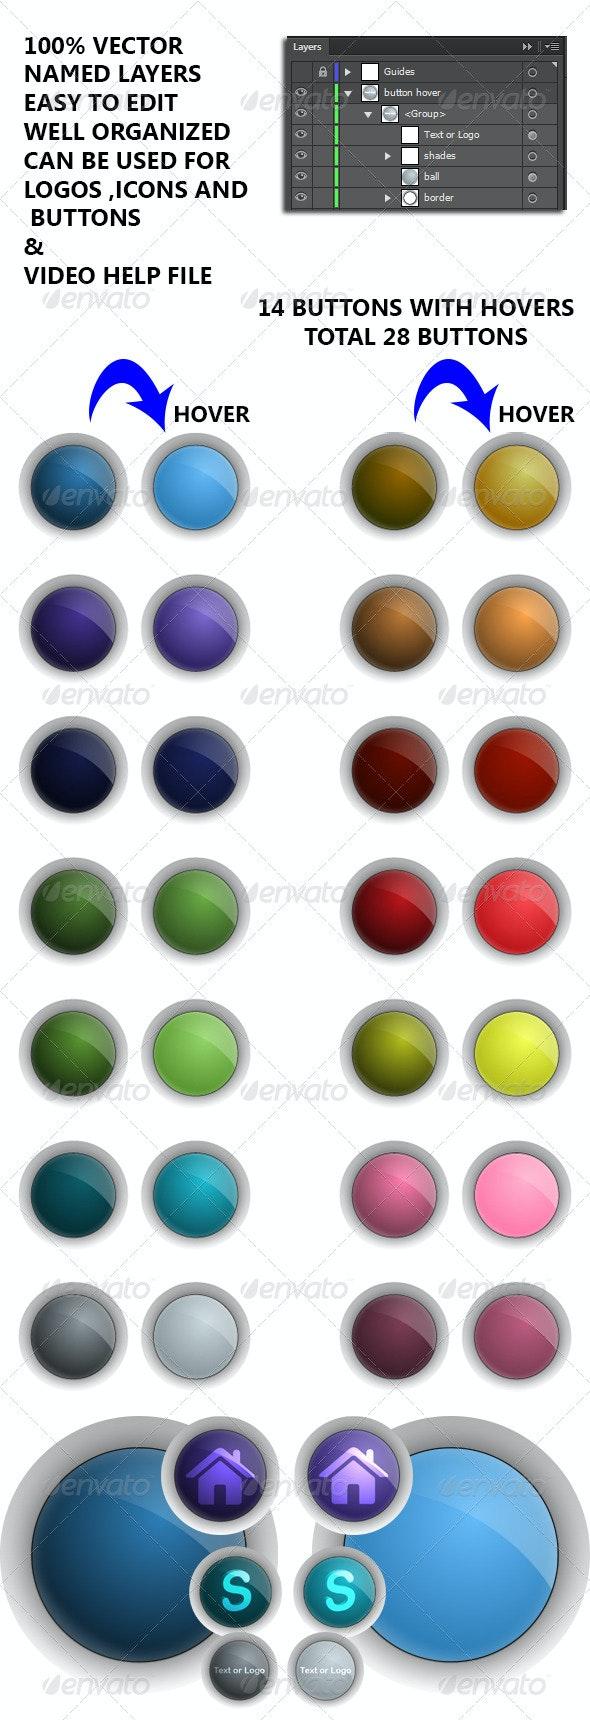 Glassy Vector Buttons - Web Elements Vectors